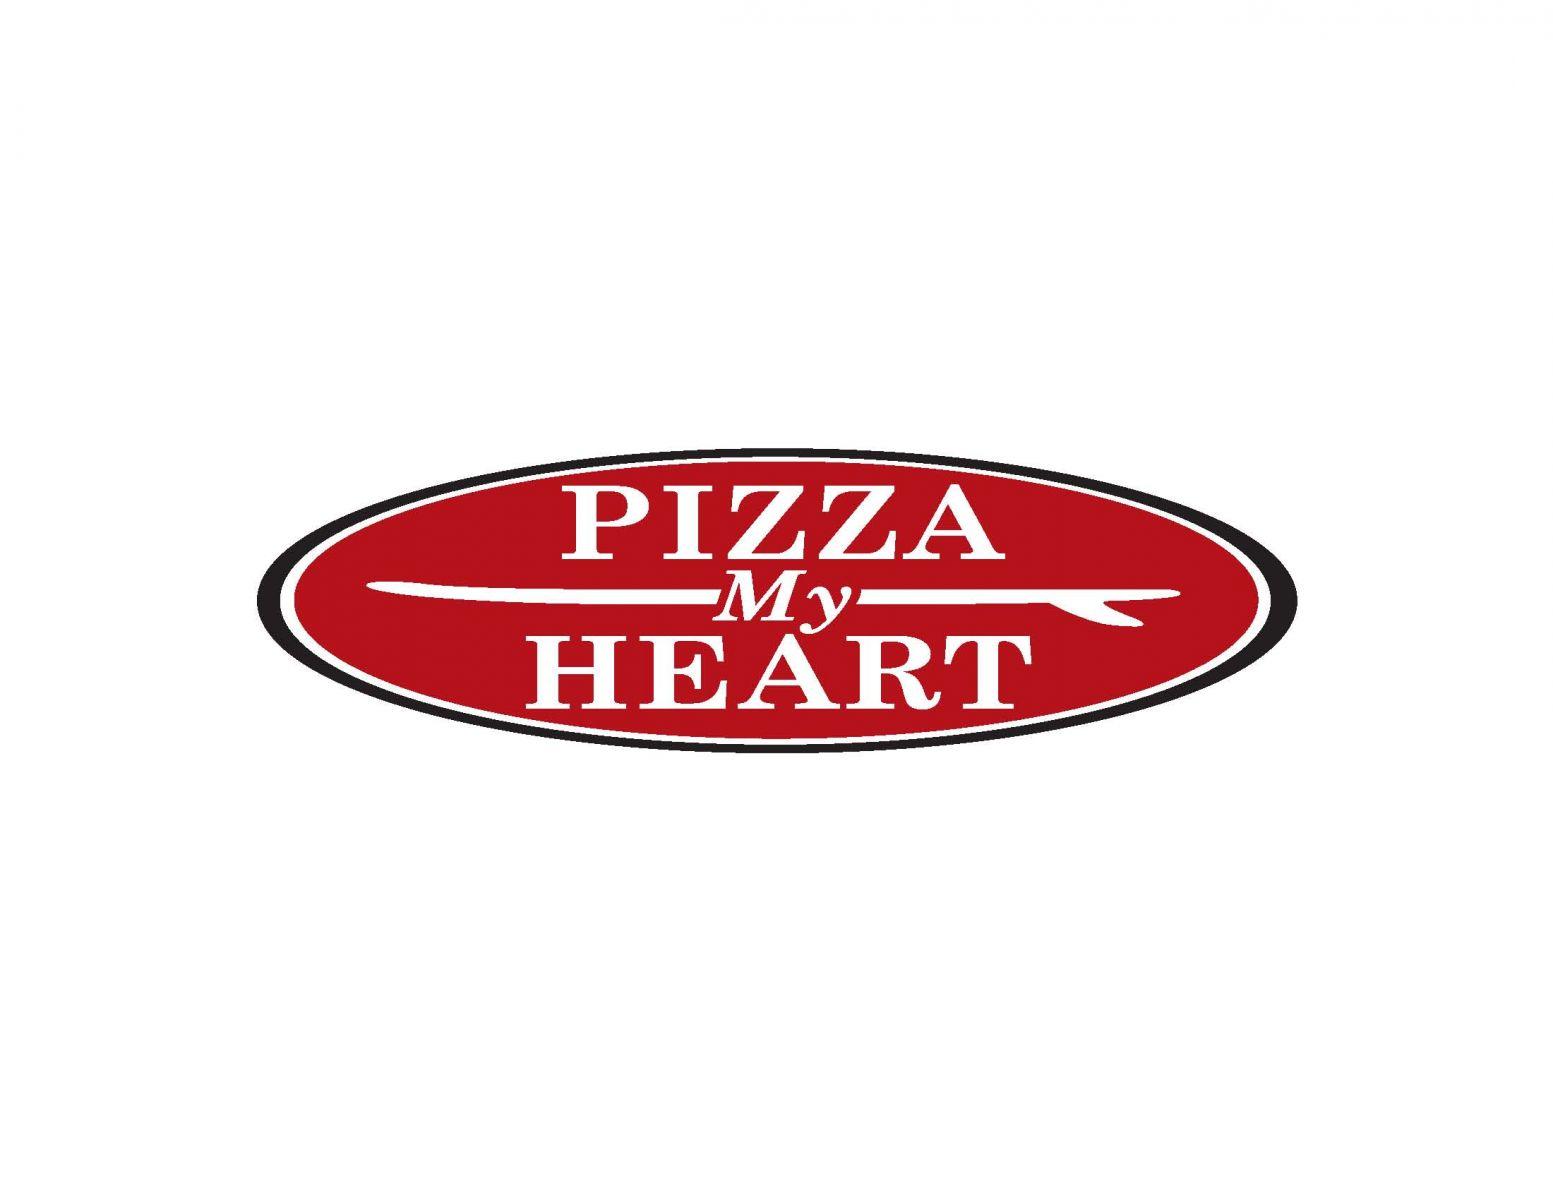 pizza my heart(1).jpg